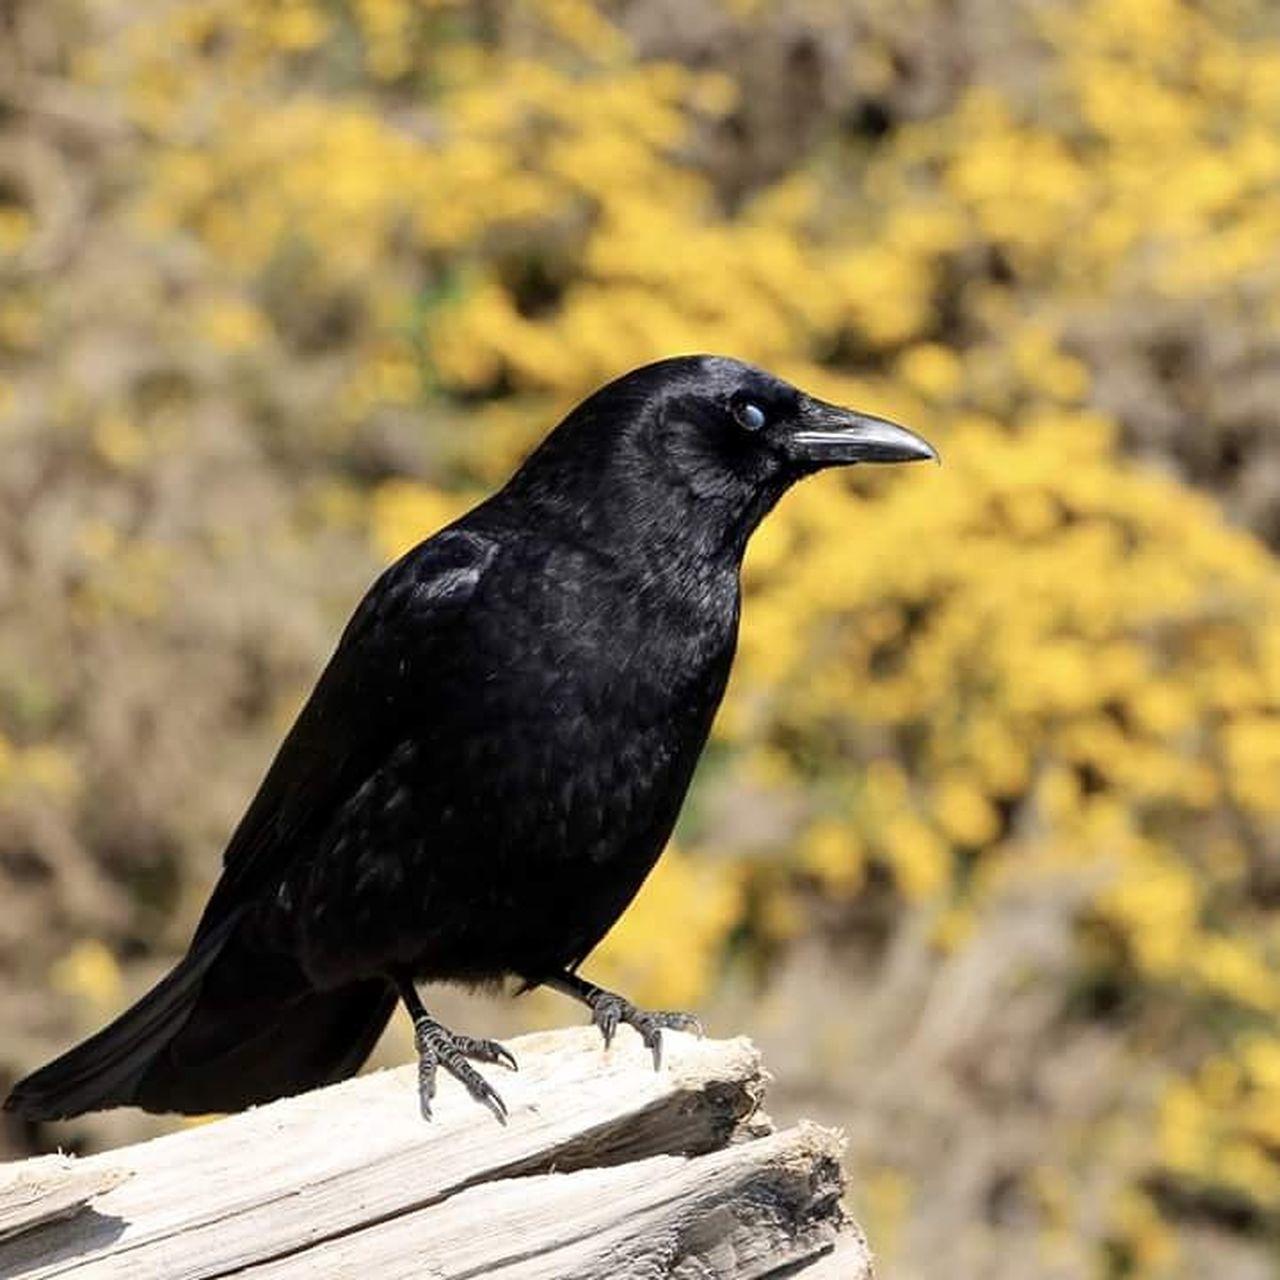 CLOSE-UP OF BLACK BIRD PERCHING ON WALL